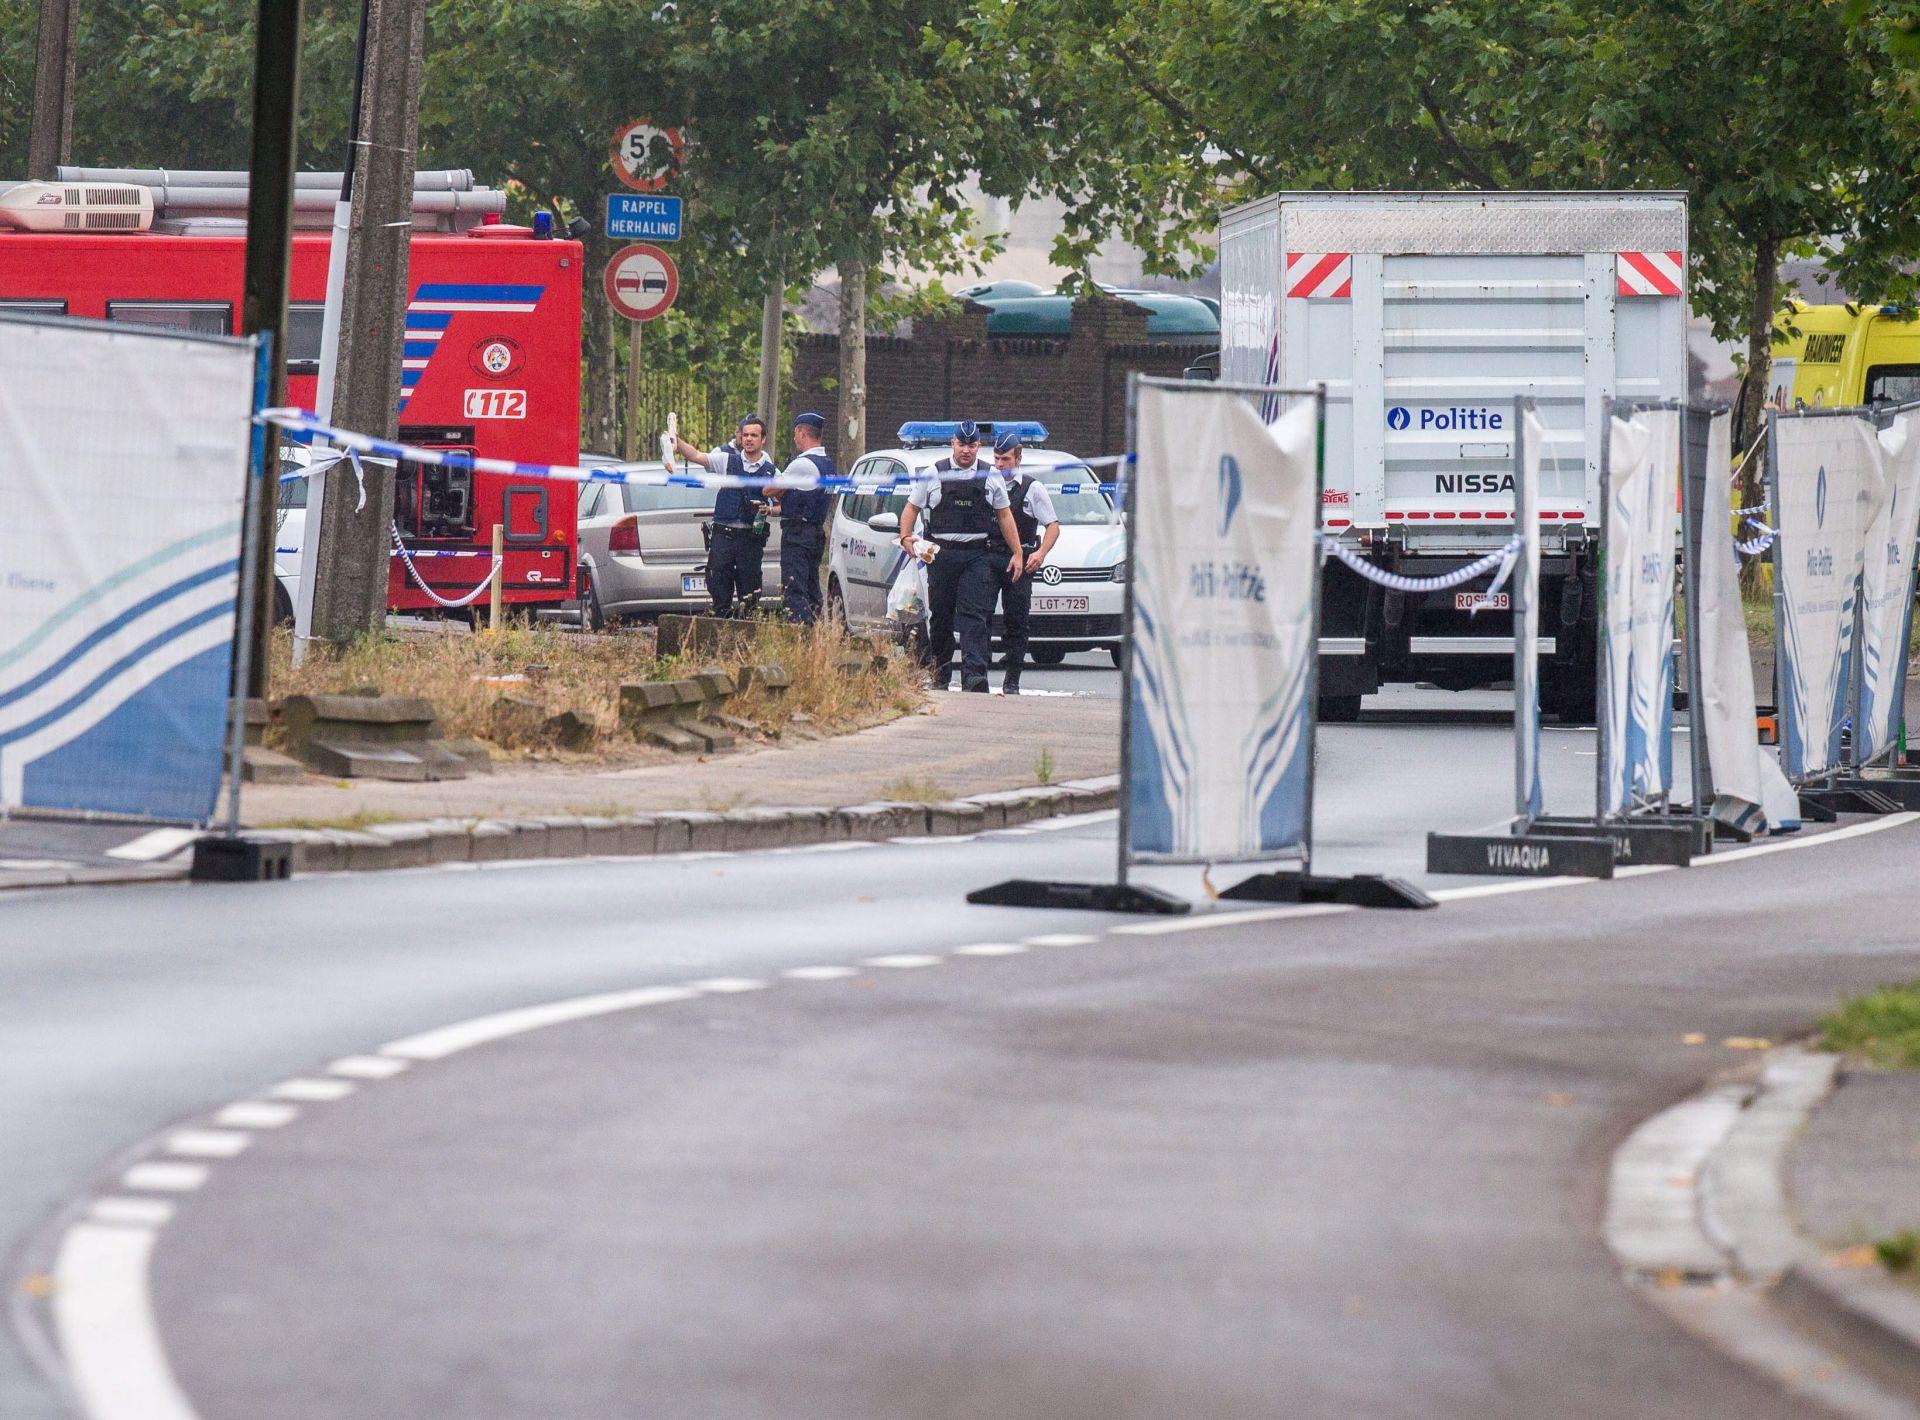 PET OSOBA PRIVEDENO: Podmetnut požar u forenzičkom institutu u Belgiji